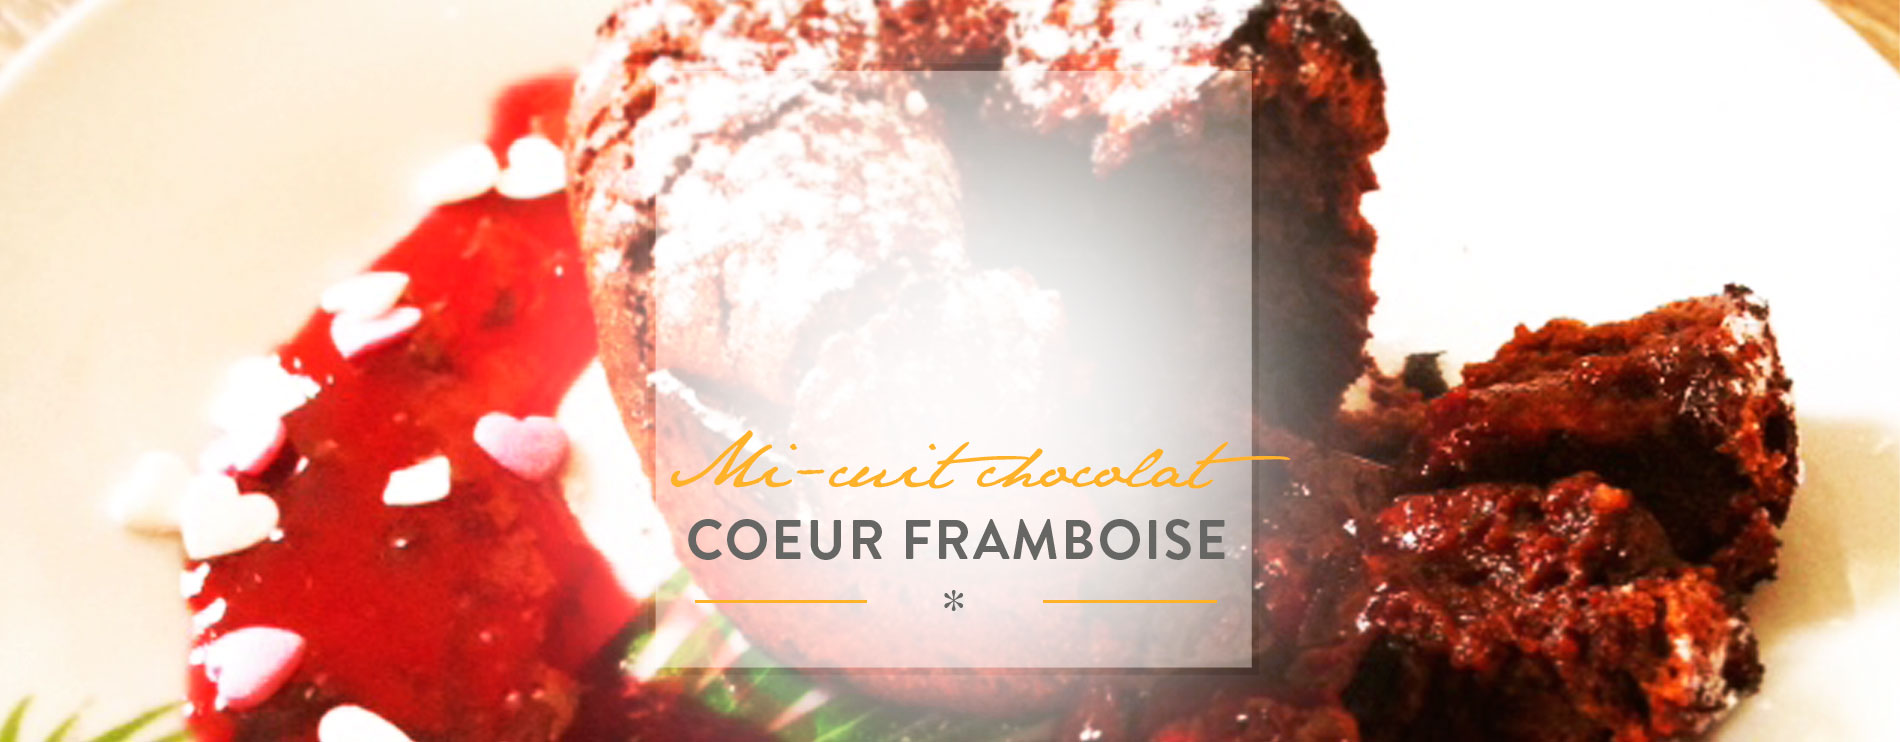 westwing-Mi-cuit-au-chocolat-coeur-framboise